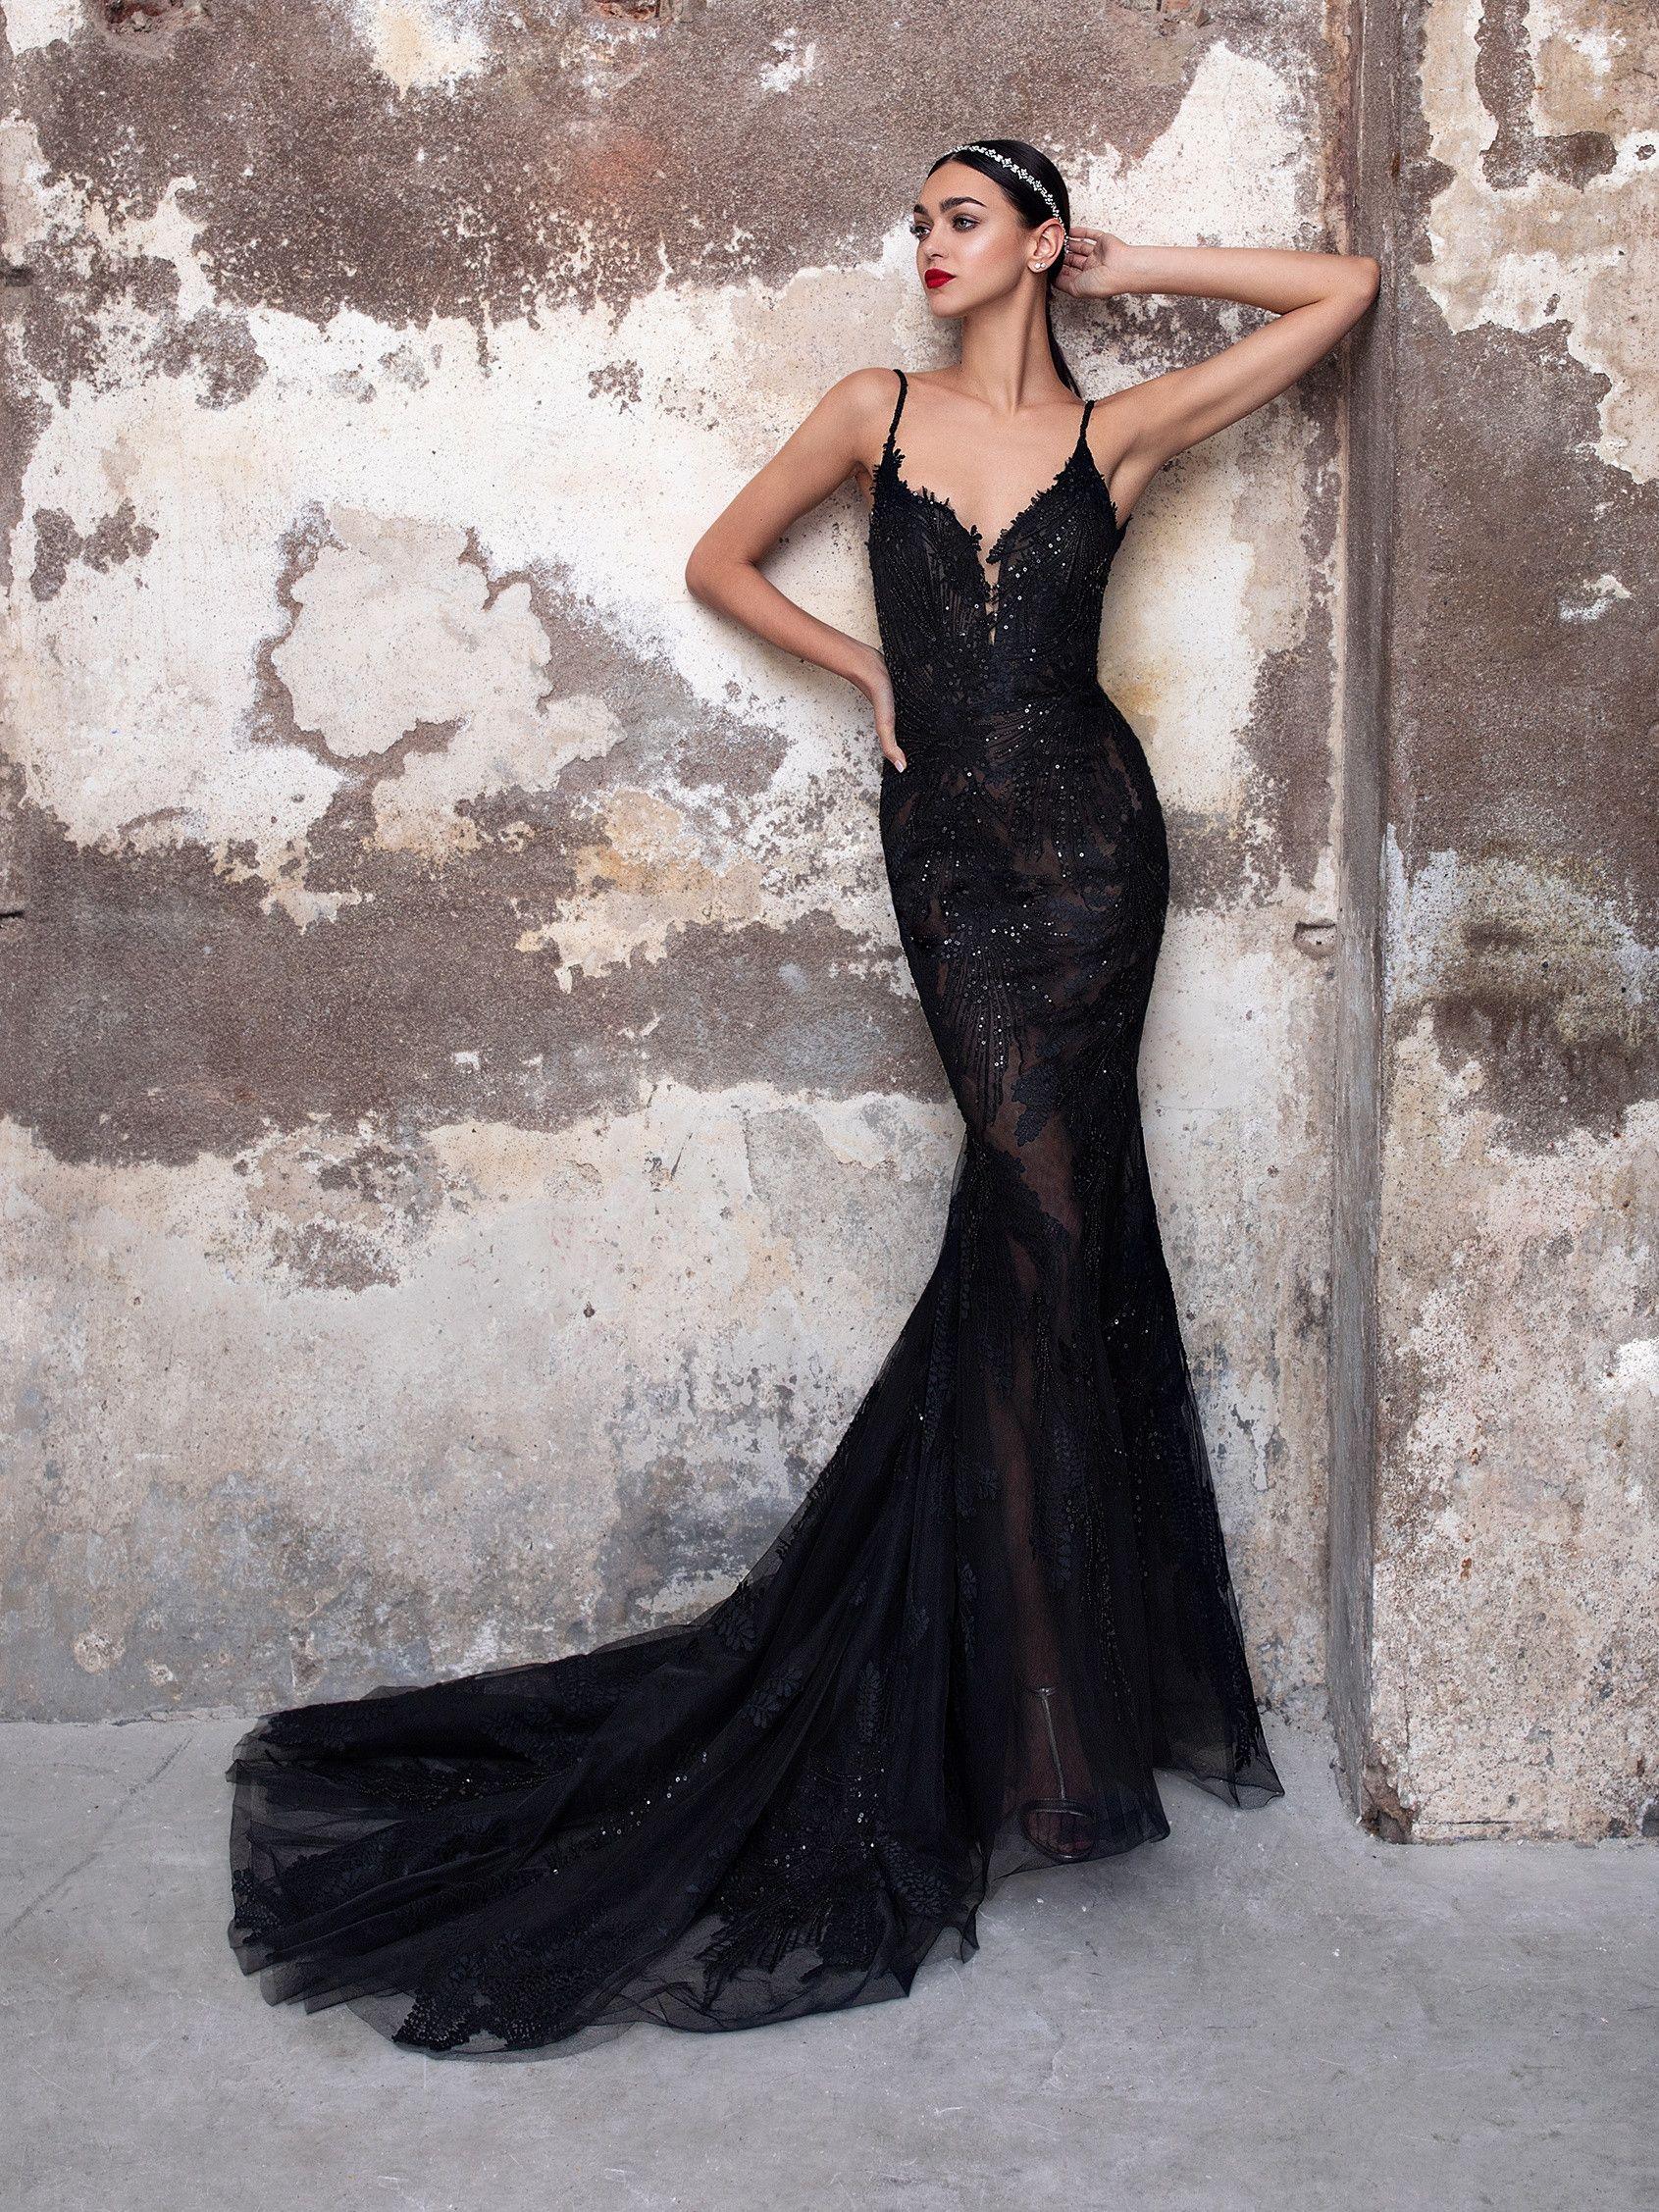 Obsidian Black Wedding Dresses Black Wedding Gowns Wedding Dress Couture [ 2255 x 1691 Pixel ]